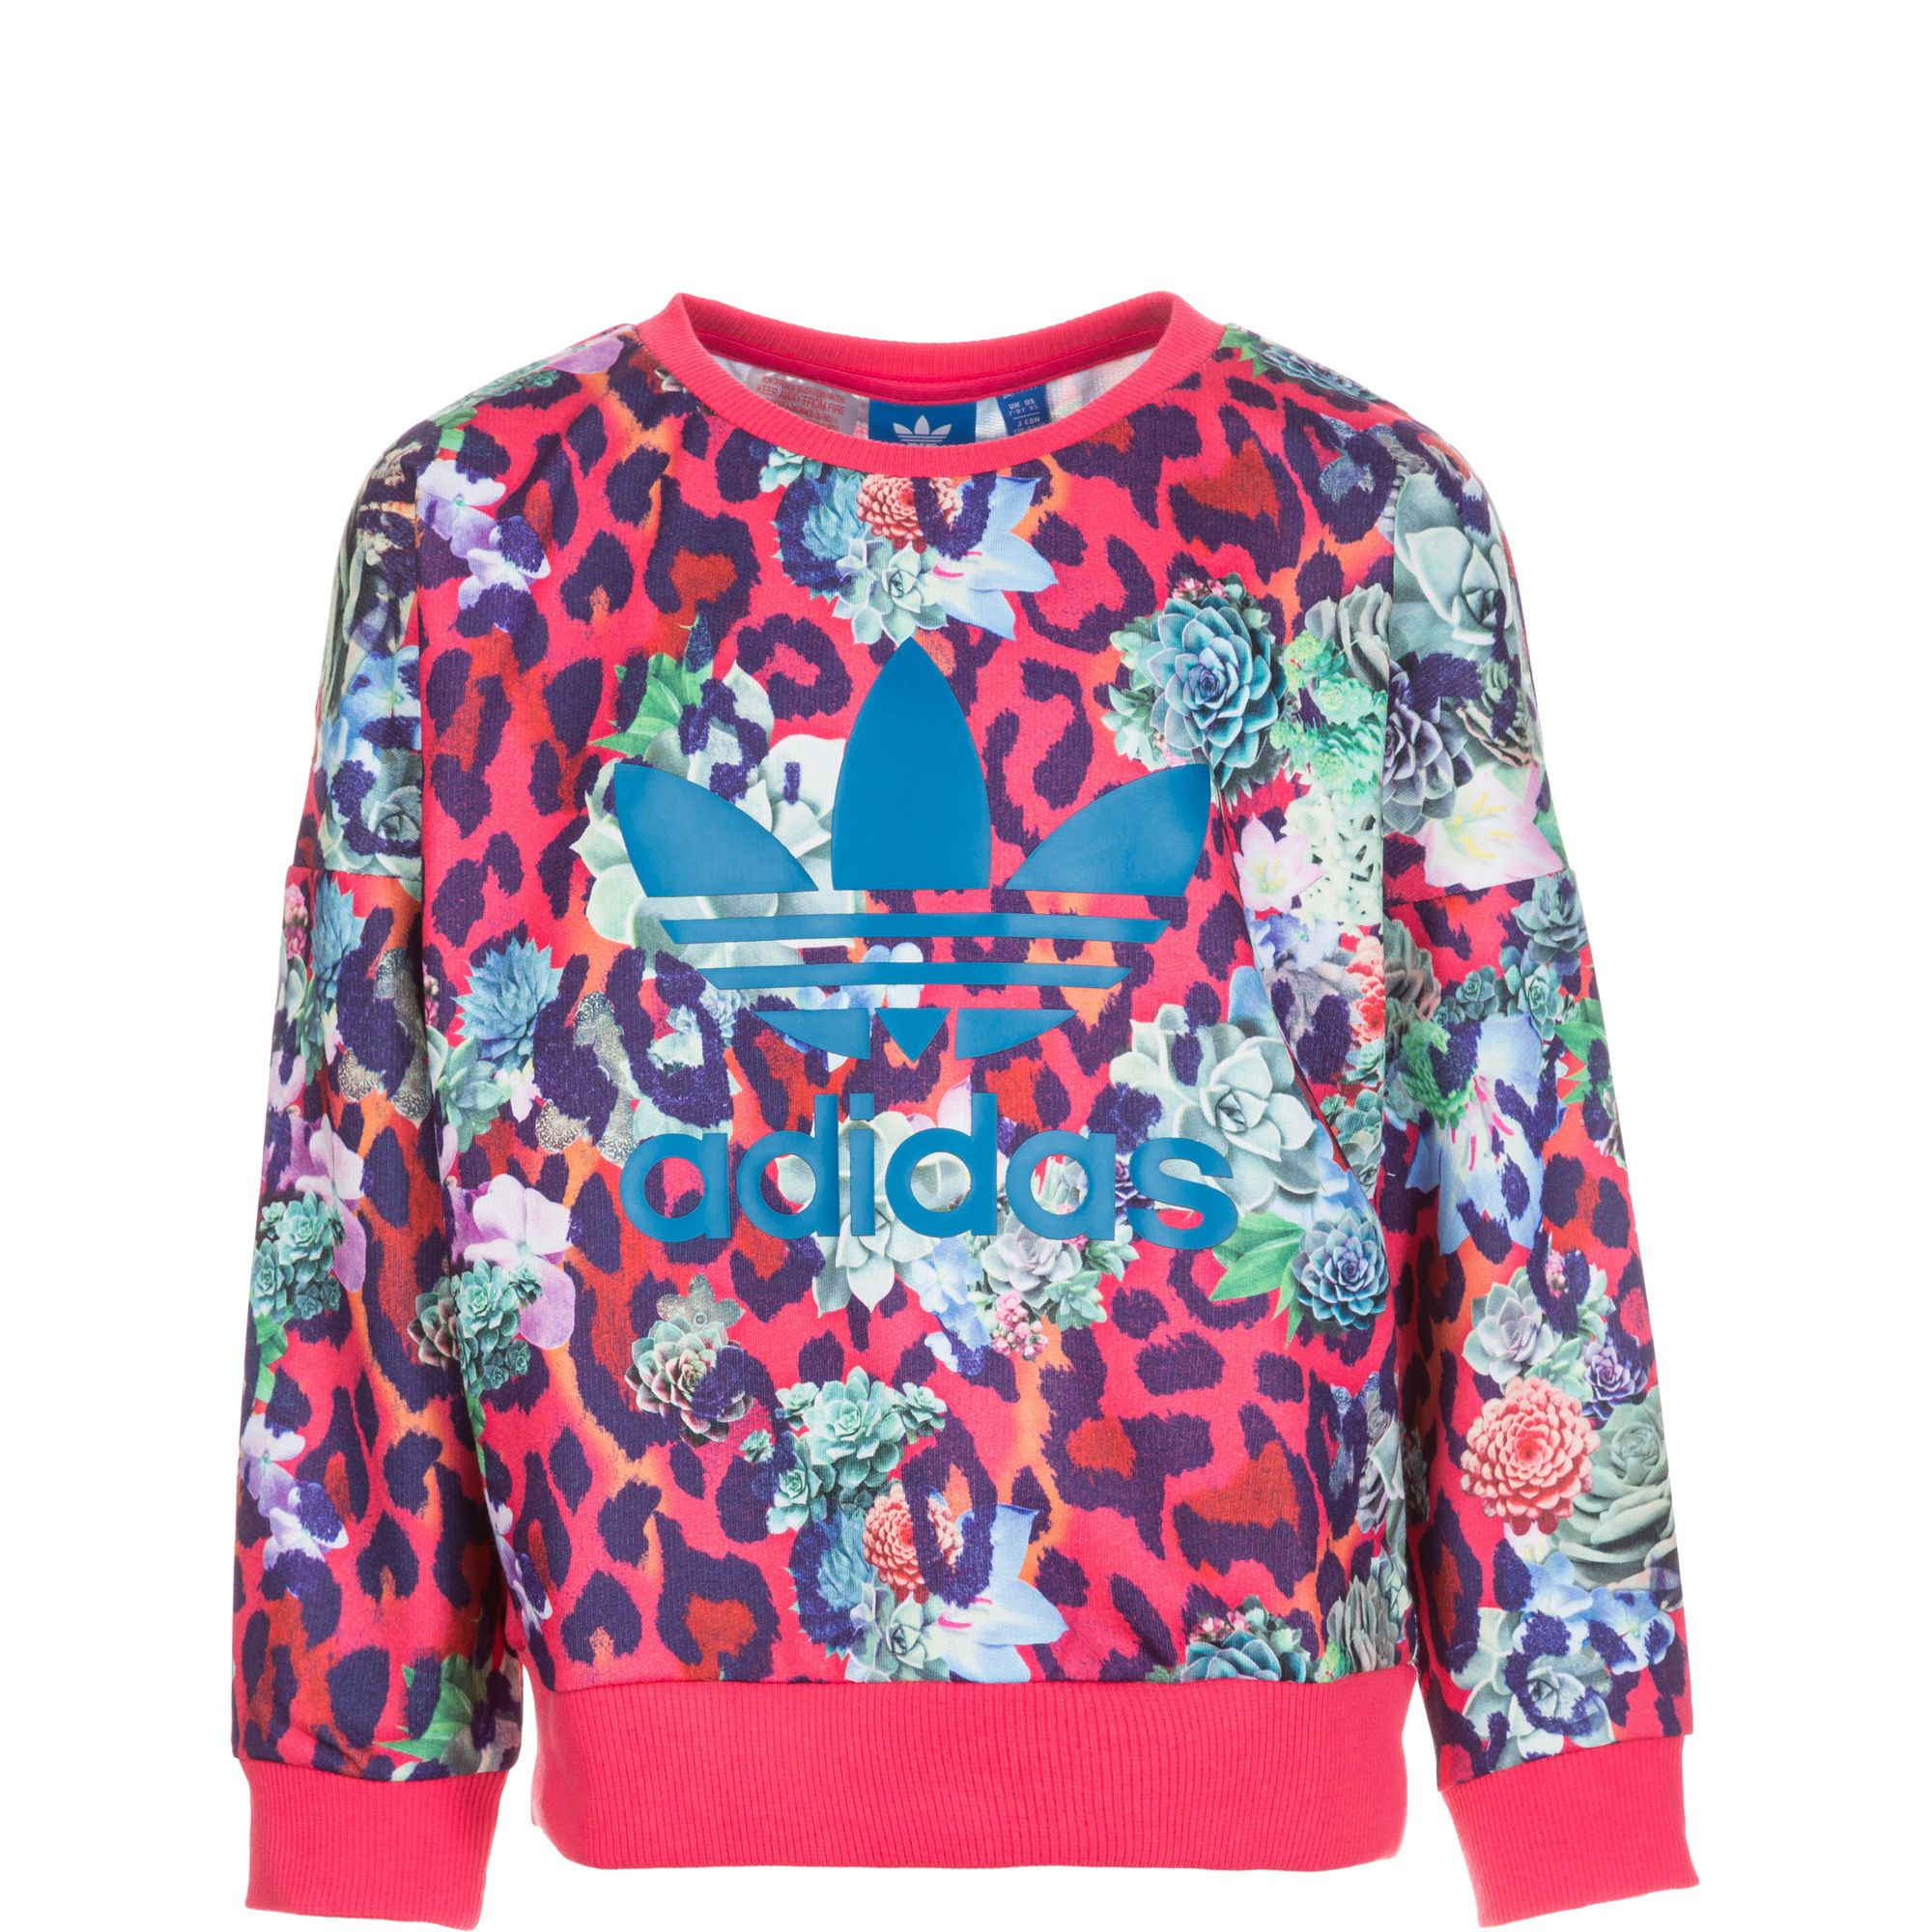 ADIDAS ORIGINALS adidas Originals Rose Crew Sweatshirt Kinder